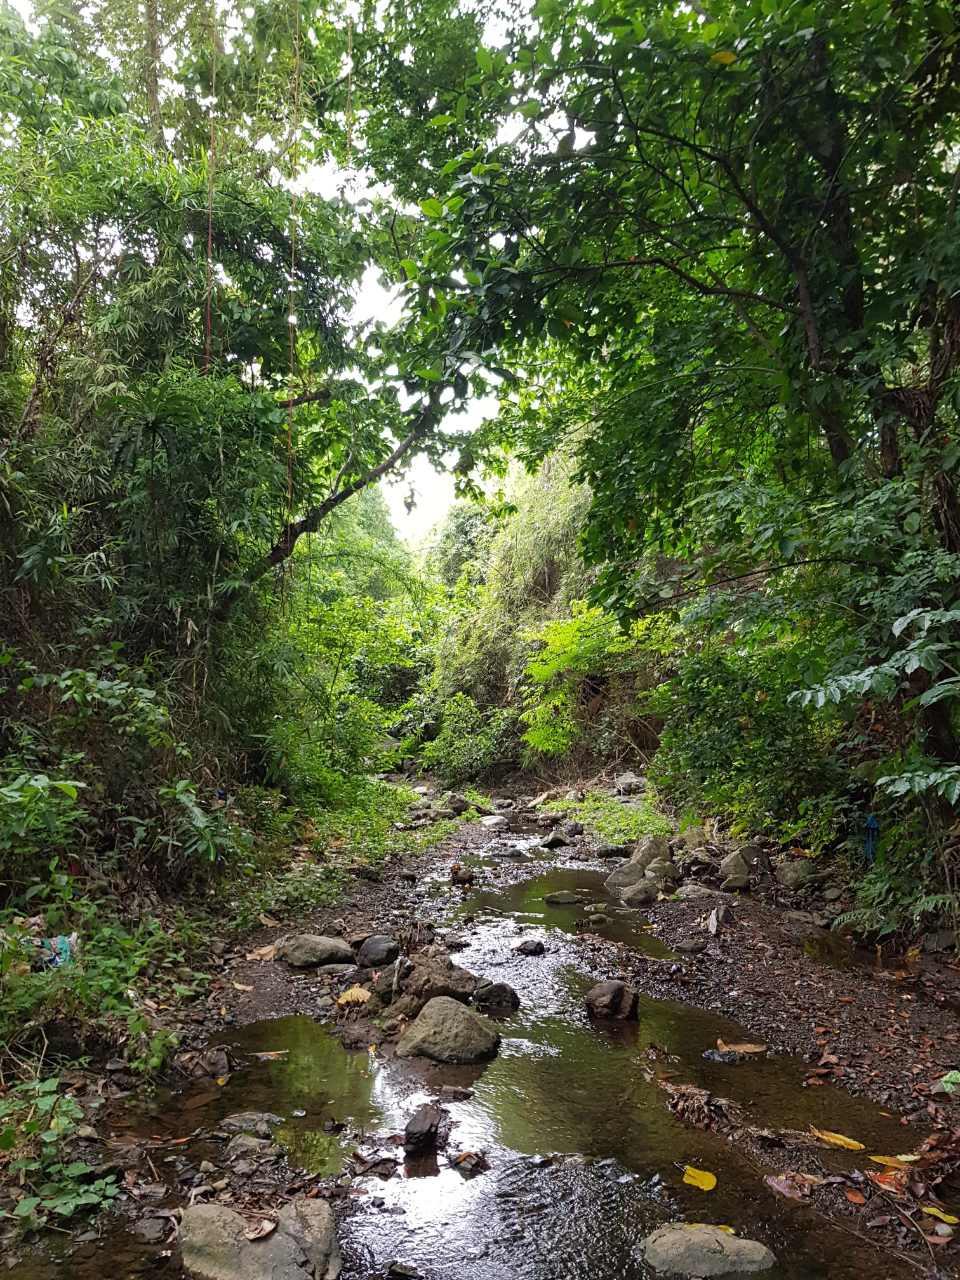 River-02-PhotographerName.JPG